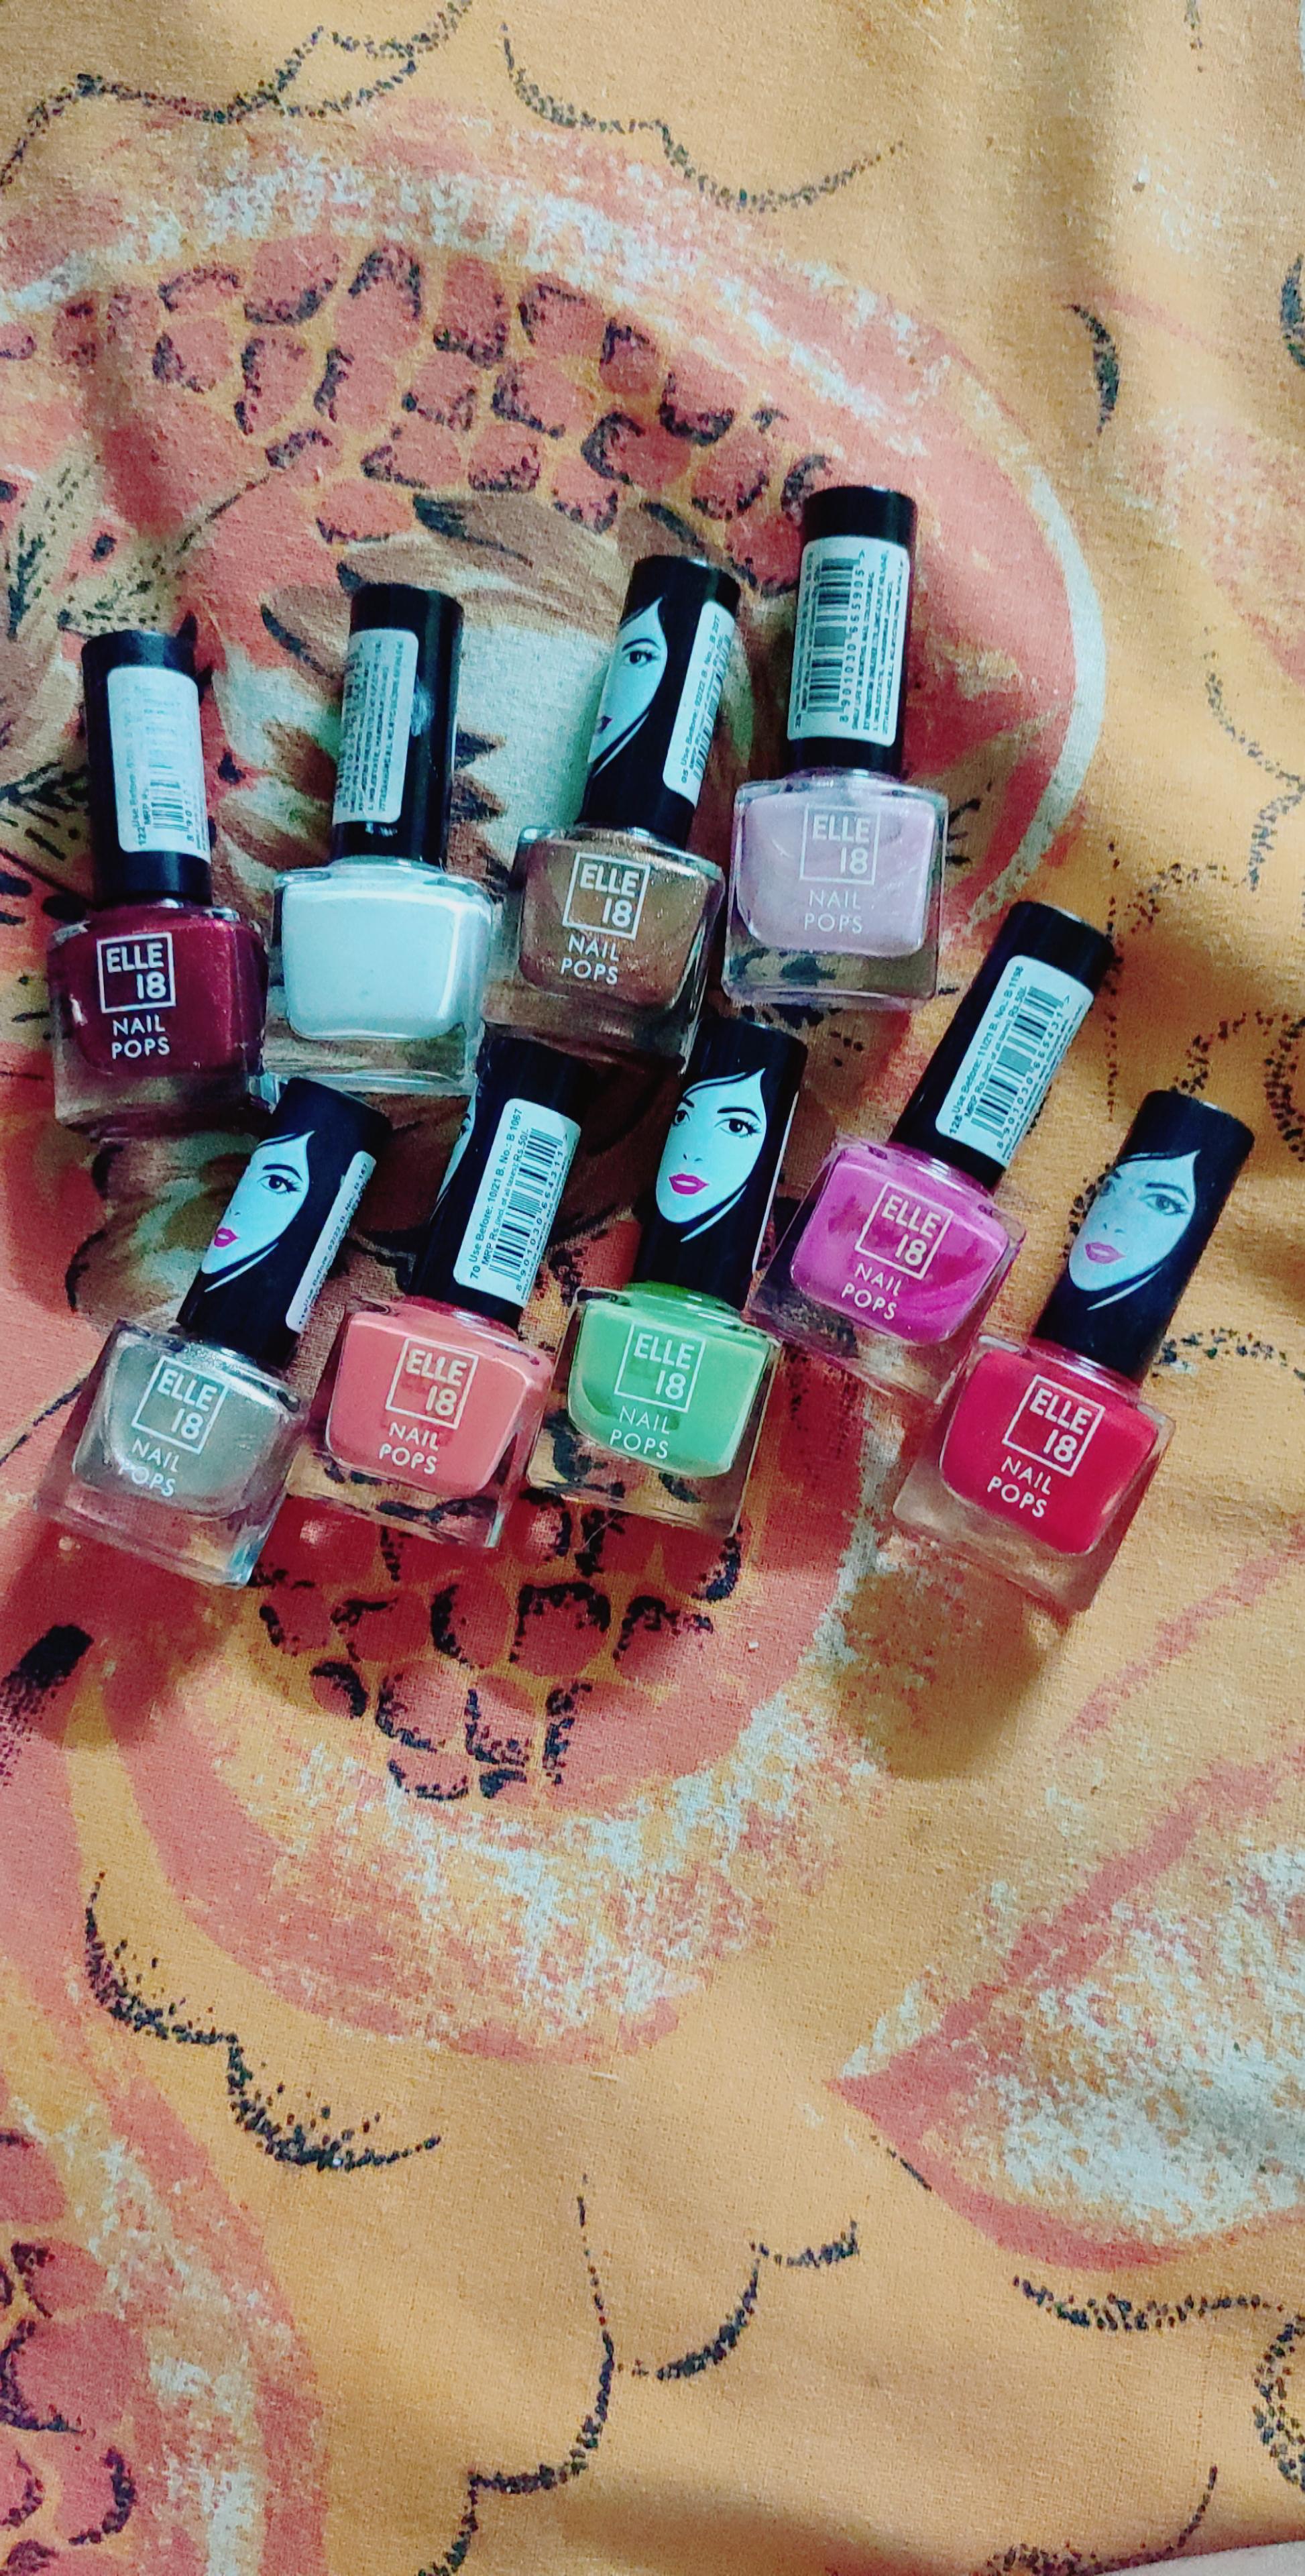 Elle 18 Nail Pops Nail Polish-Most affordable nailpaint-By sneha8620